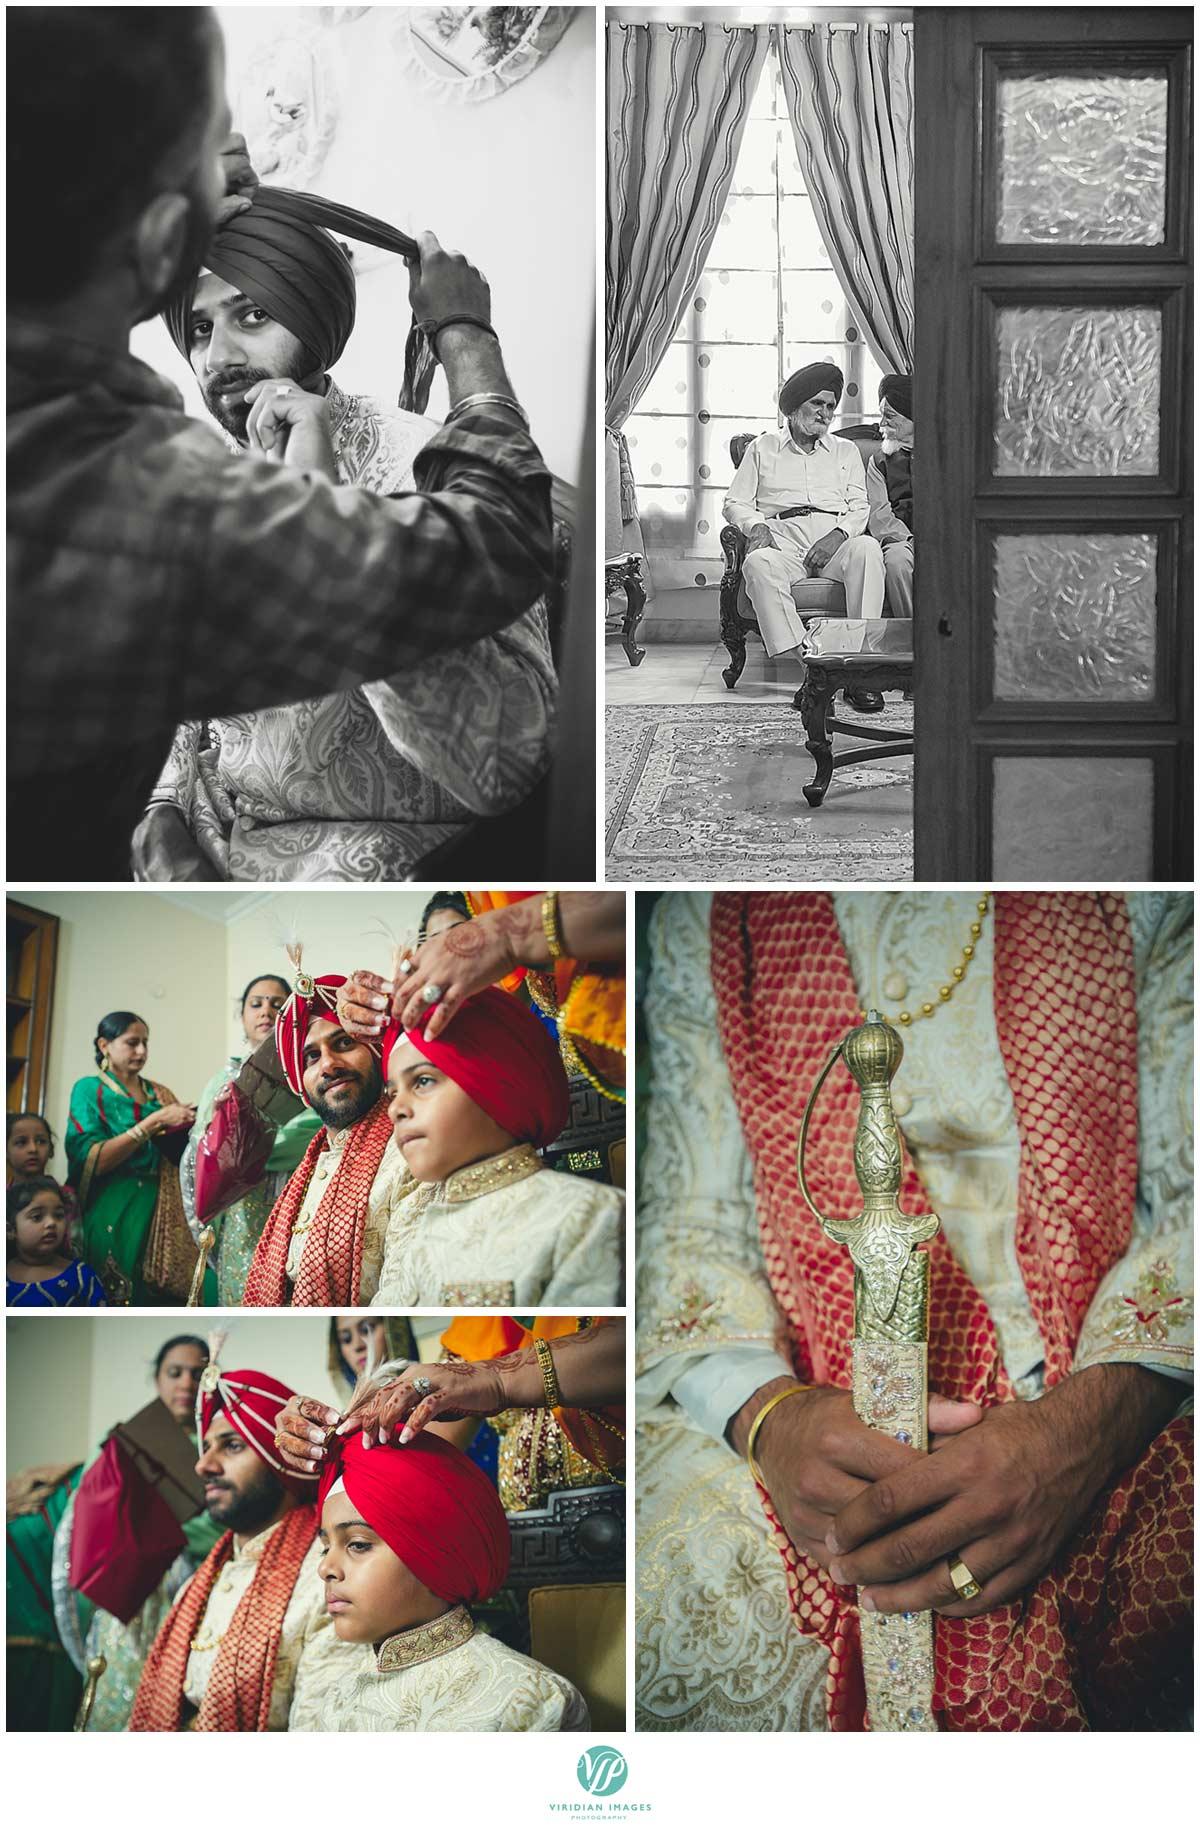 India_Chandigarh_Wedding_Viridian_Images_Photography_poto_10